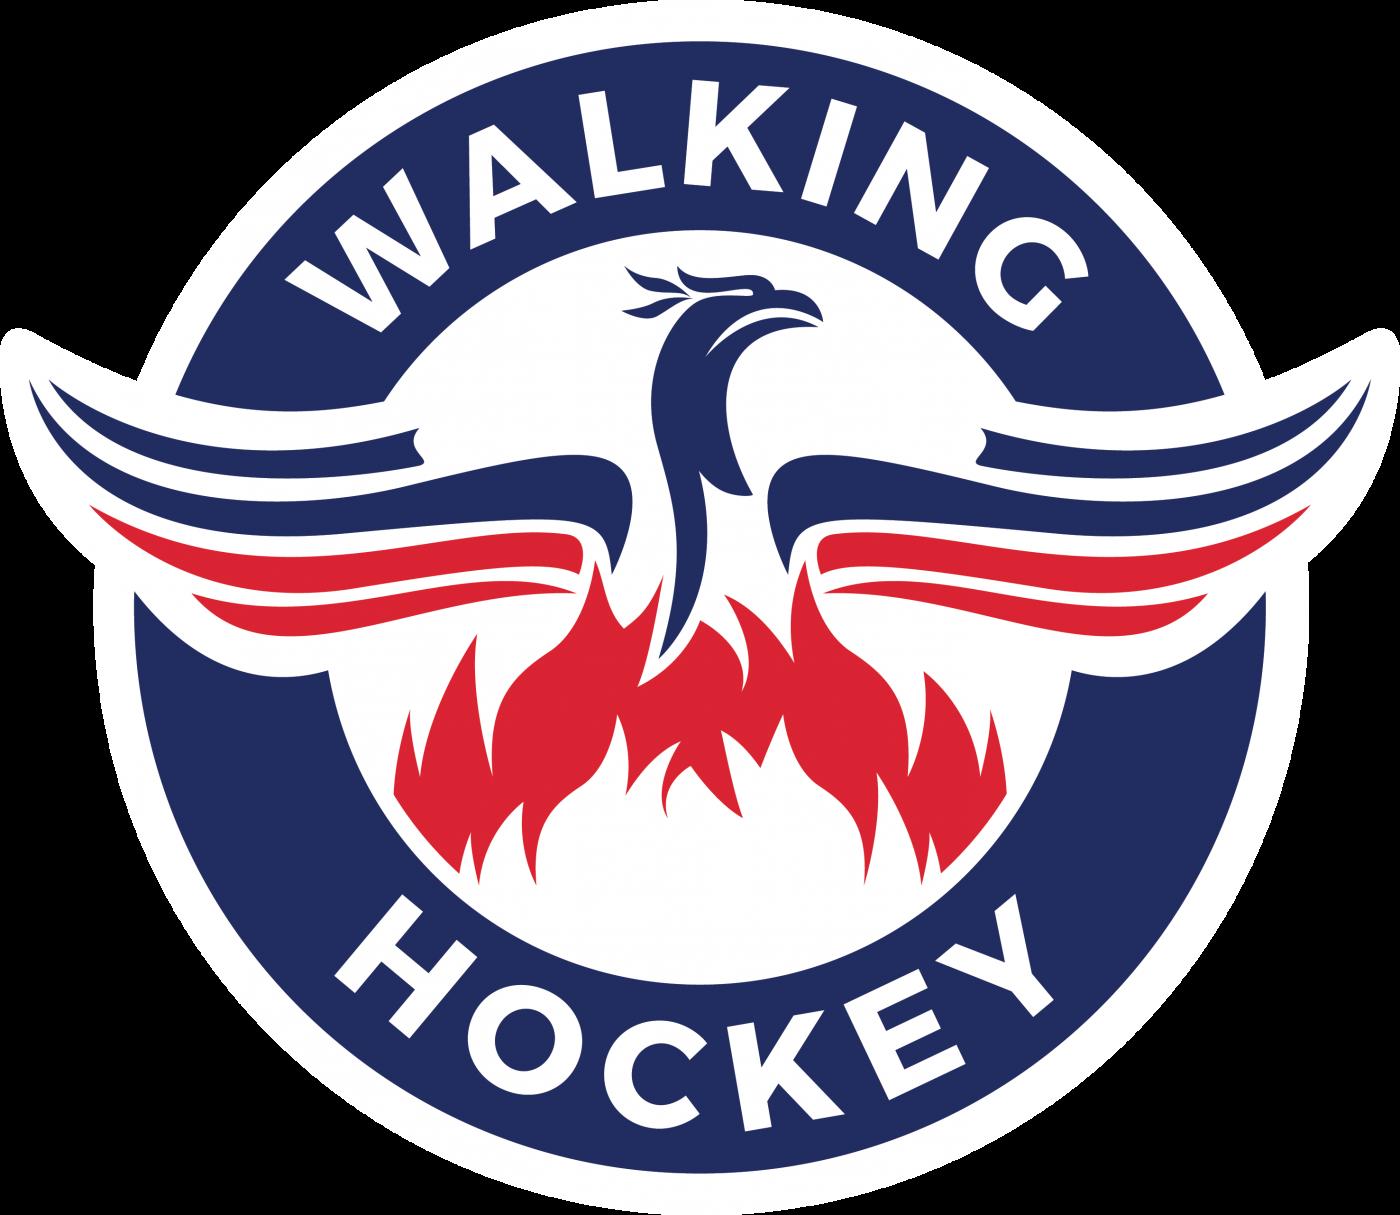 What Is Walking Hockey?